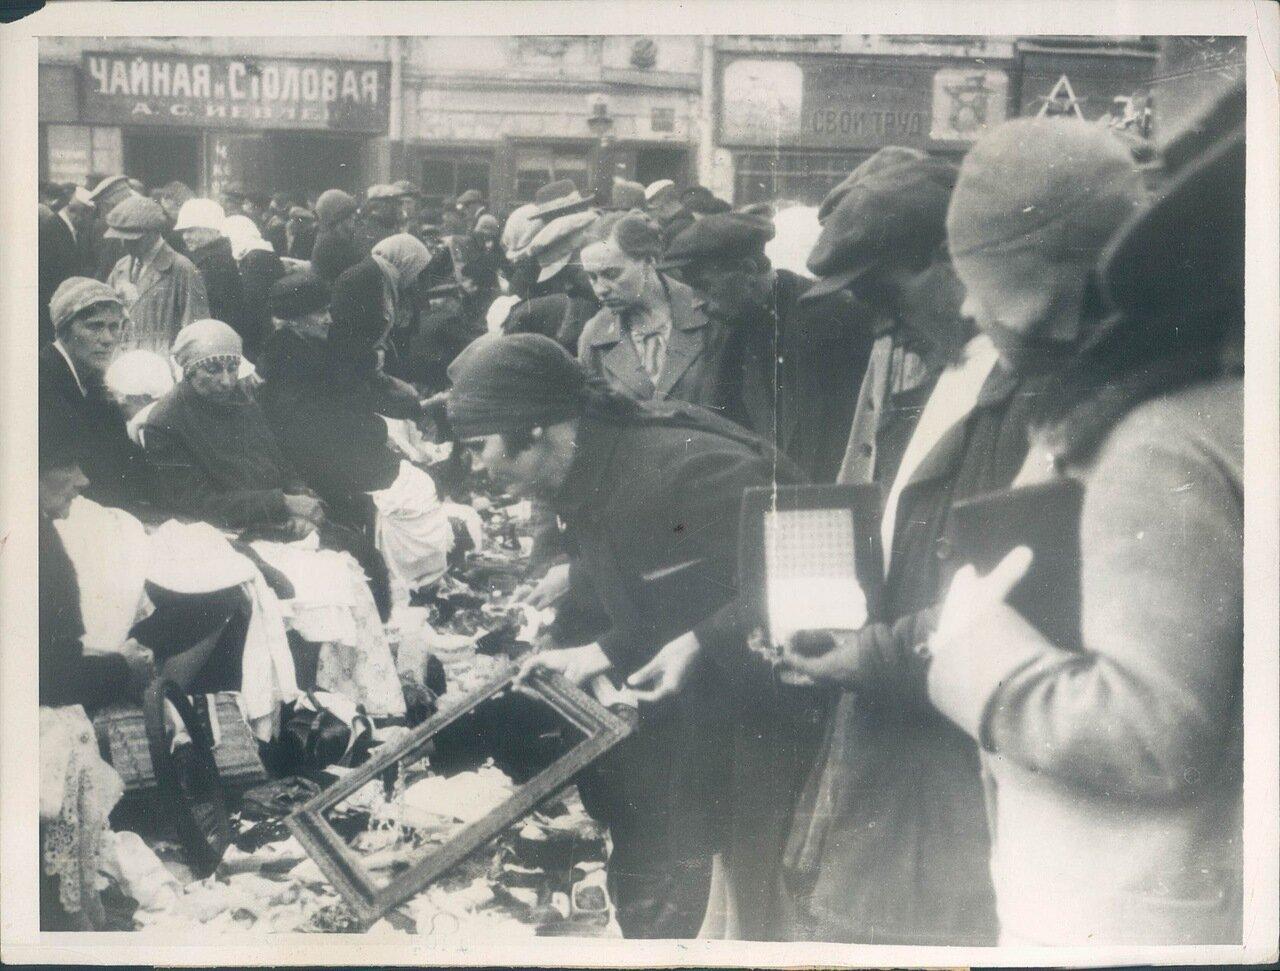 1930. 25 марта. На стихийном рынке